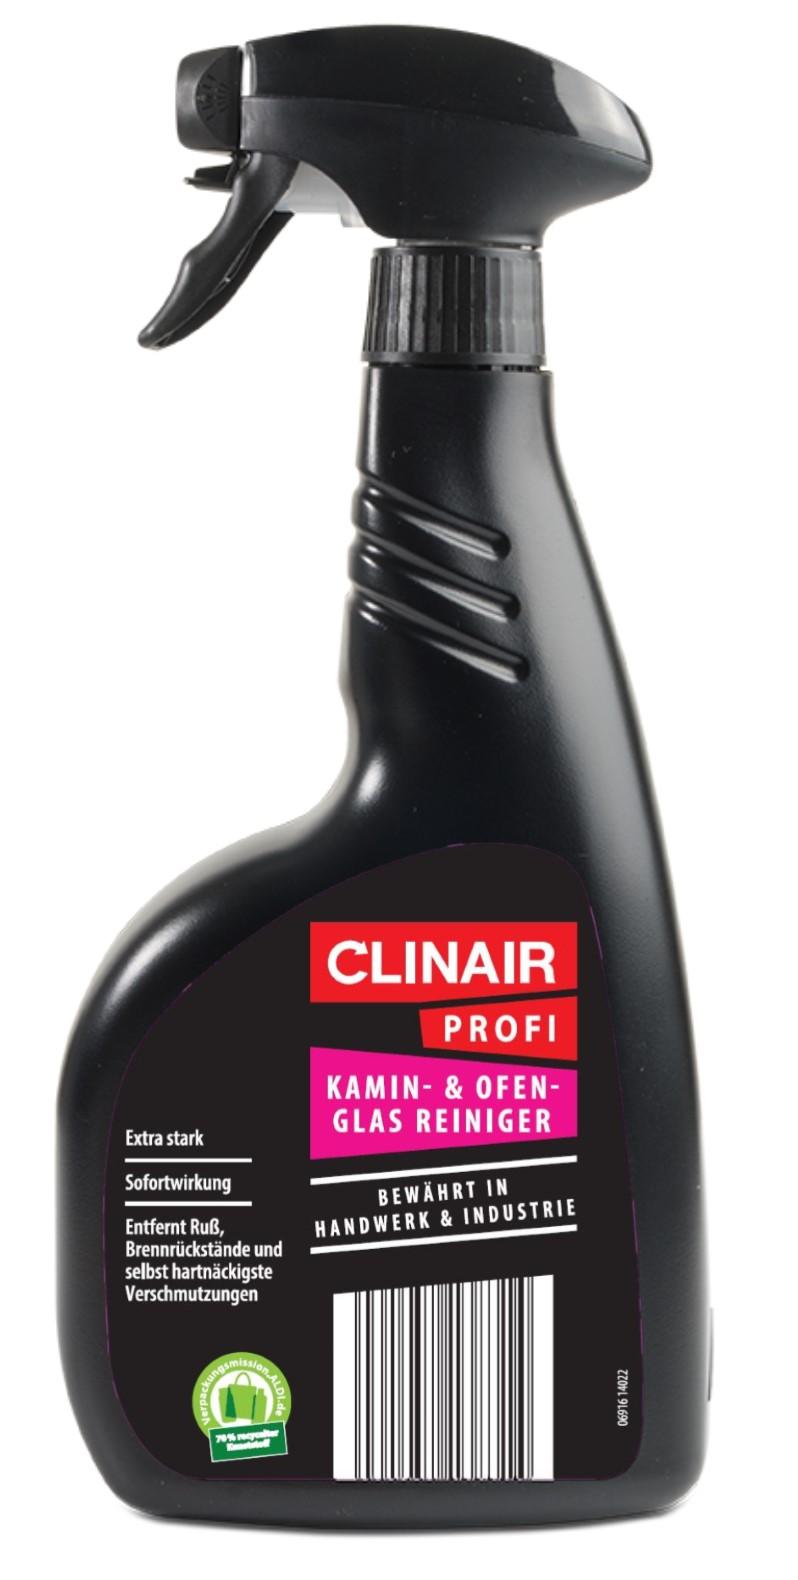 Clinair Kamin- & Ofenglas Reiniger